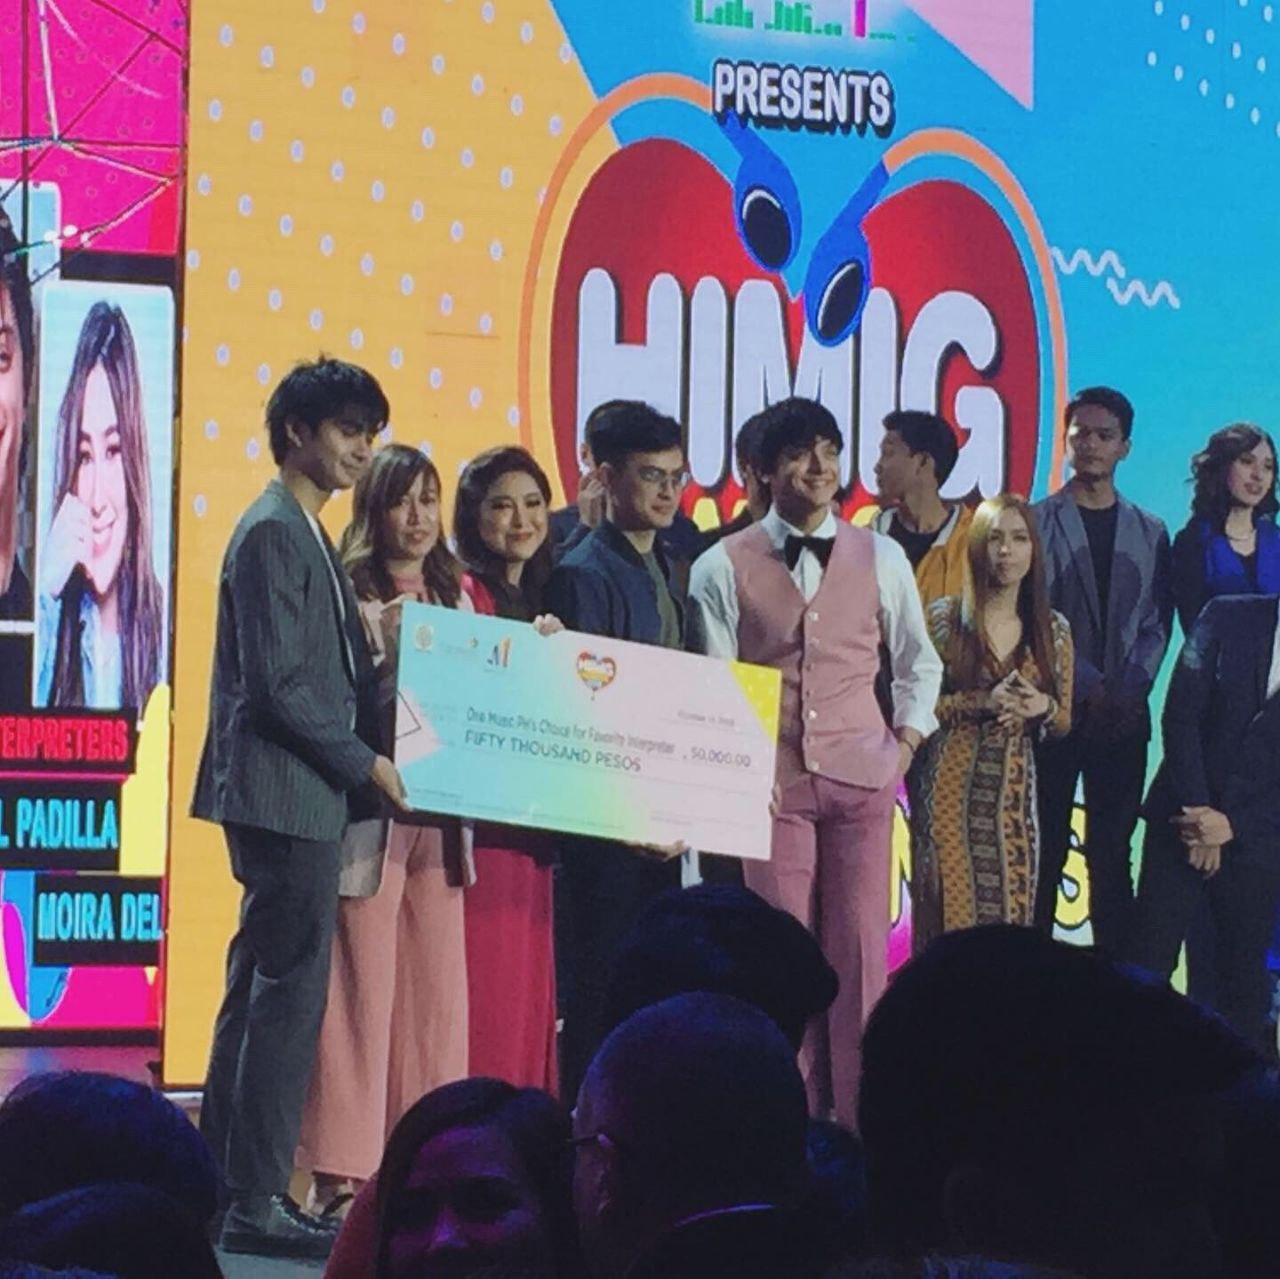 #HimigHandog2019: Daniel Padilla, Moira dela Torre win OneMusicPH's Choice for Best Interpreter